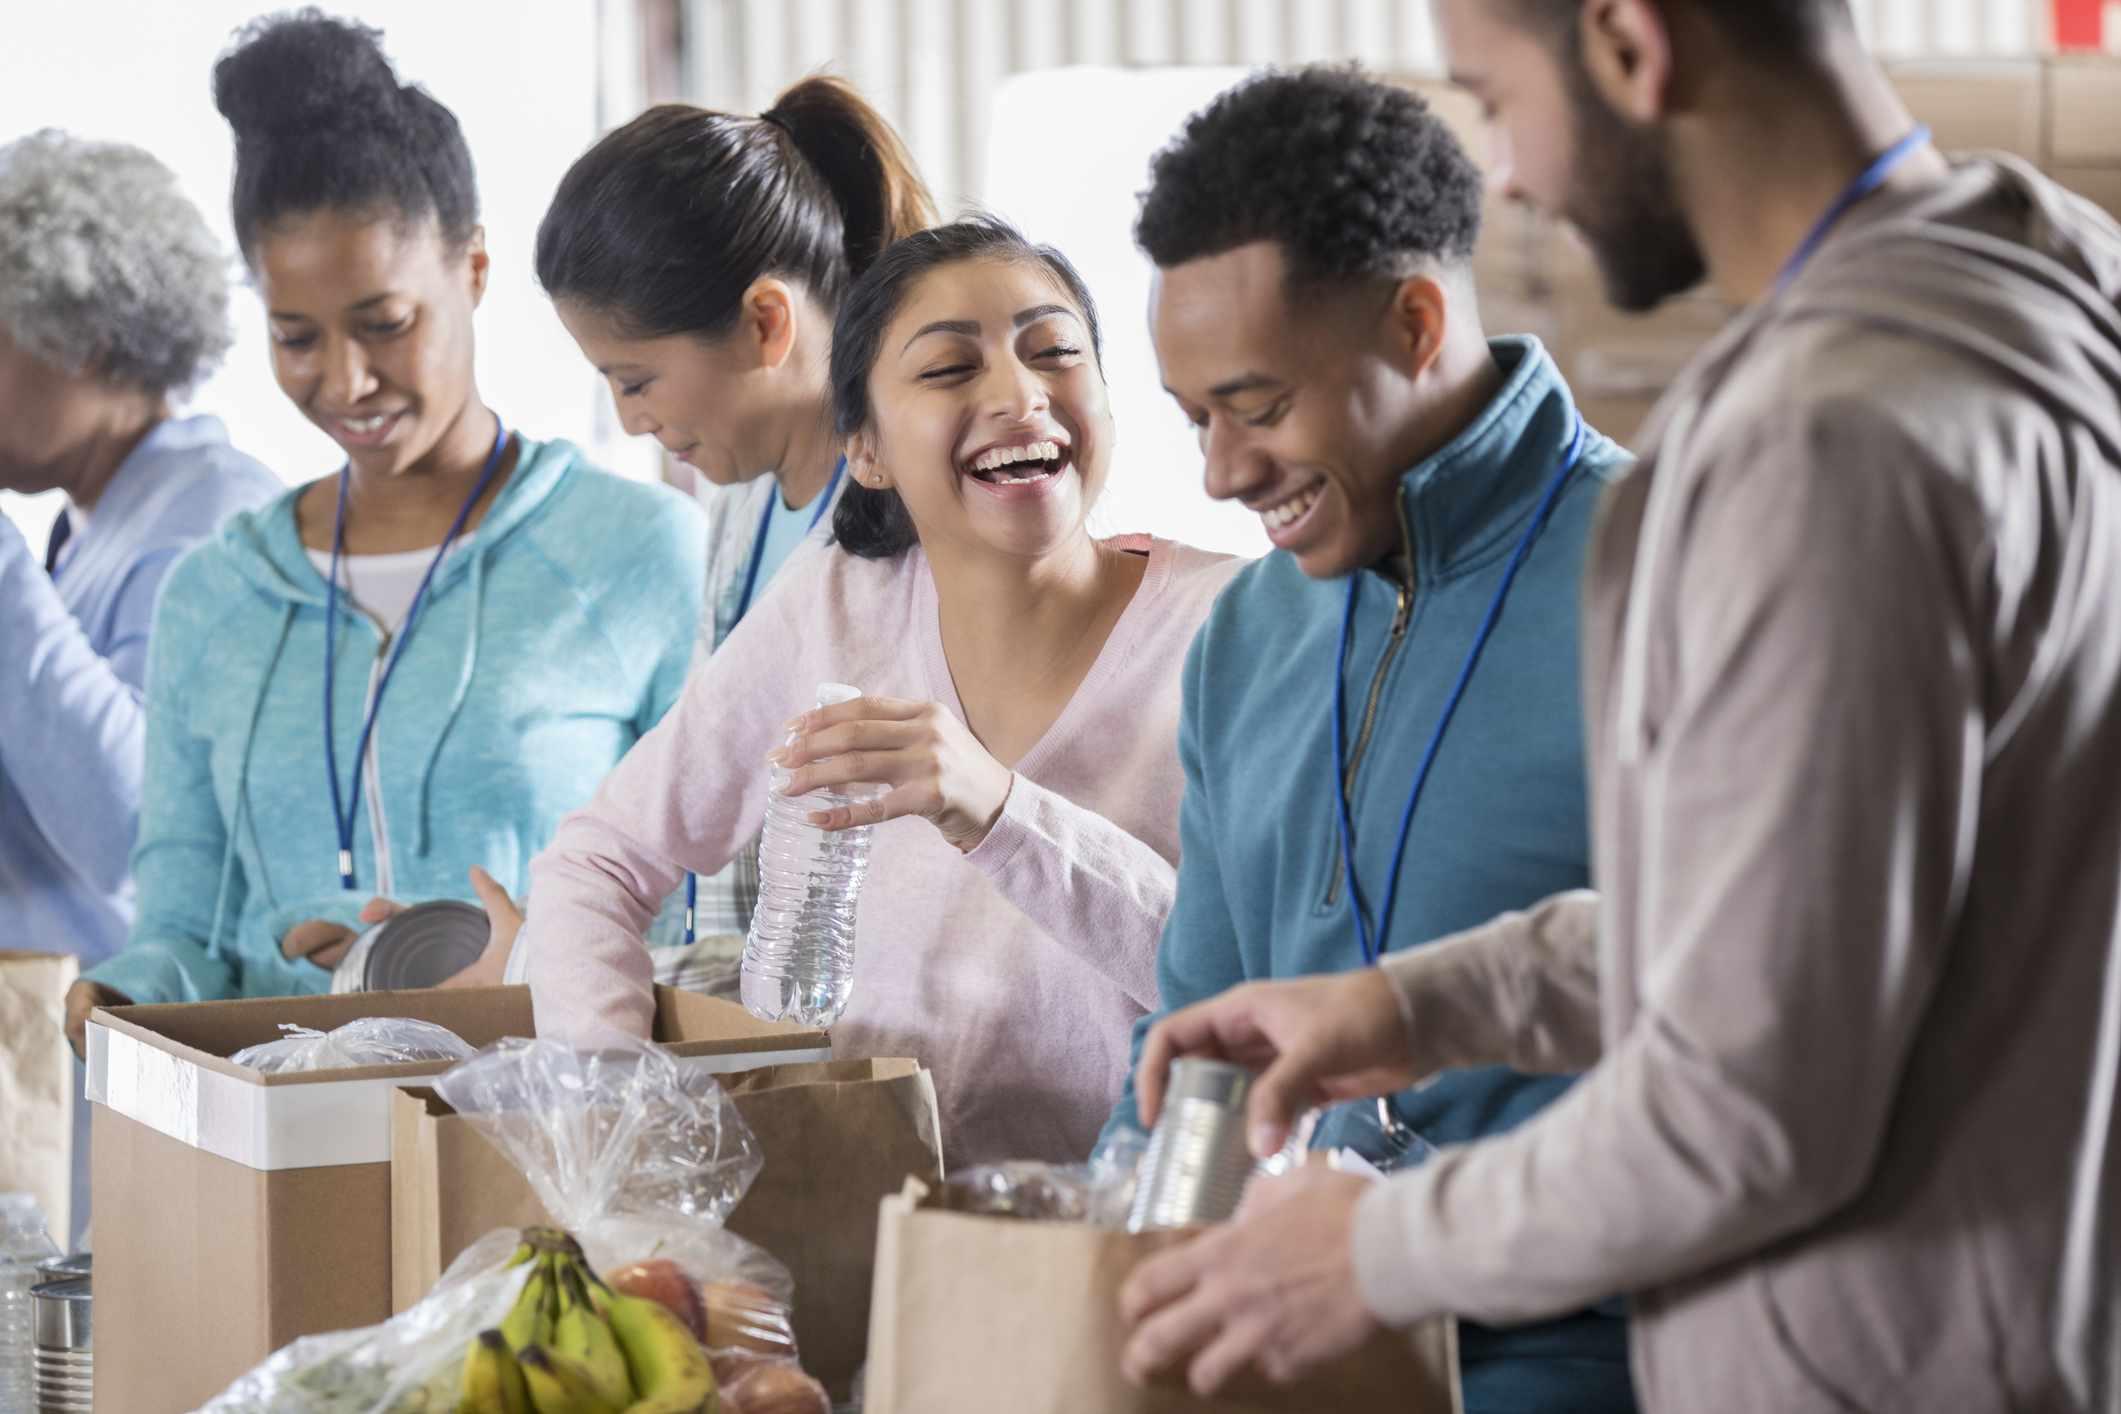 People volunteering at a food drive